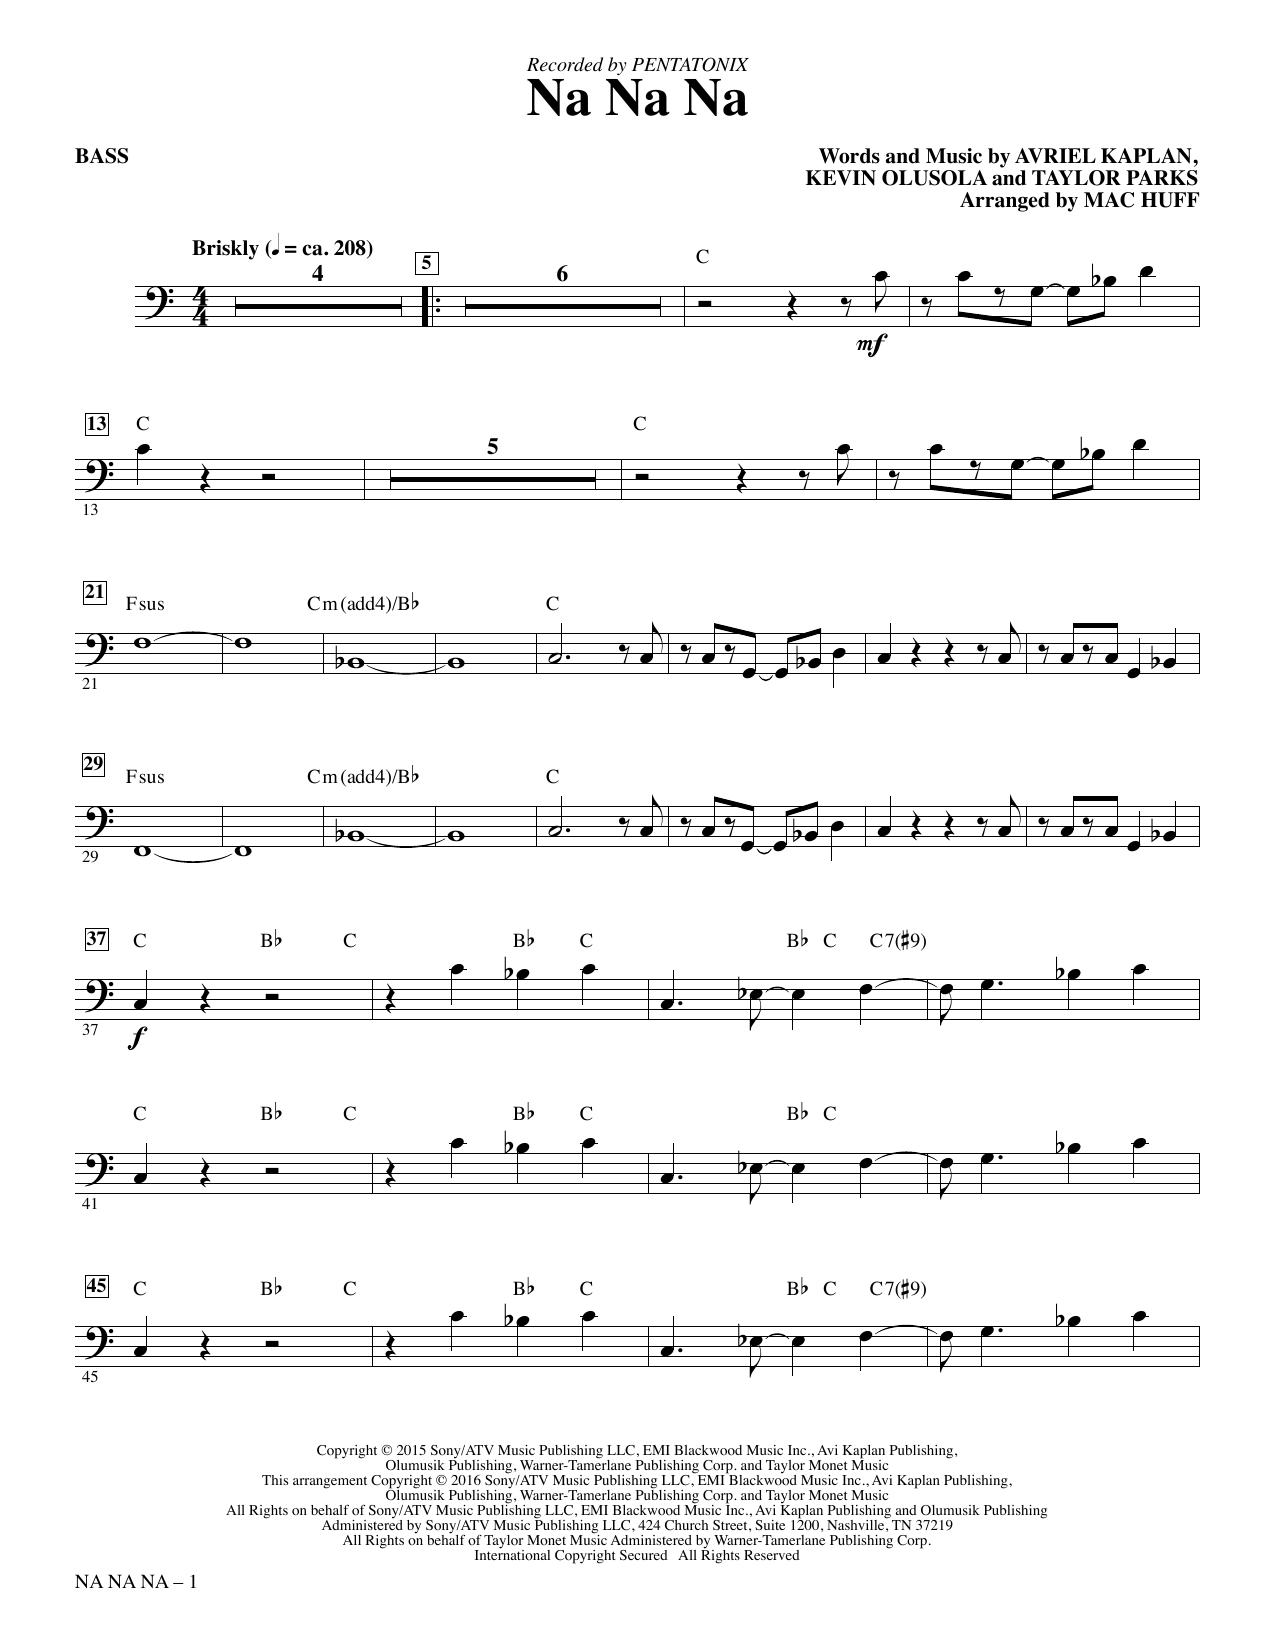 Pentatonix - Na Na Na - Bass